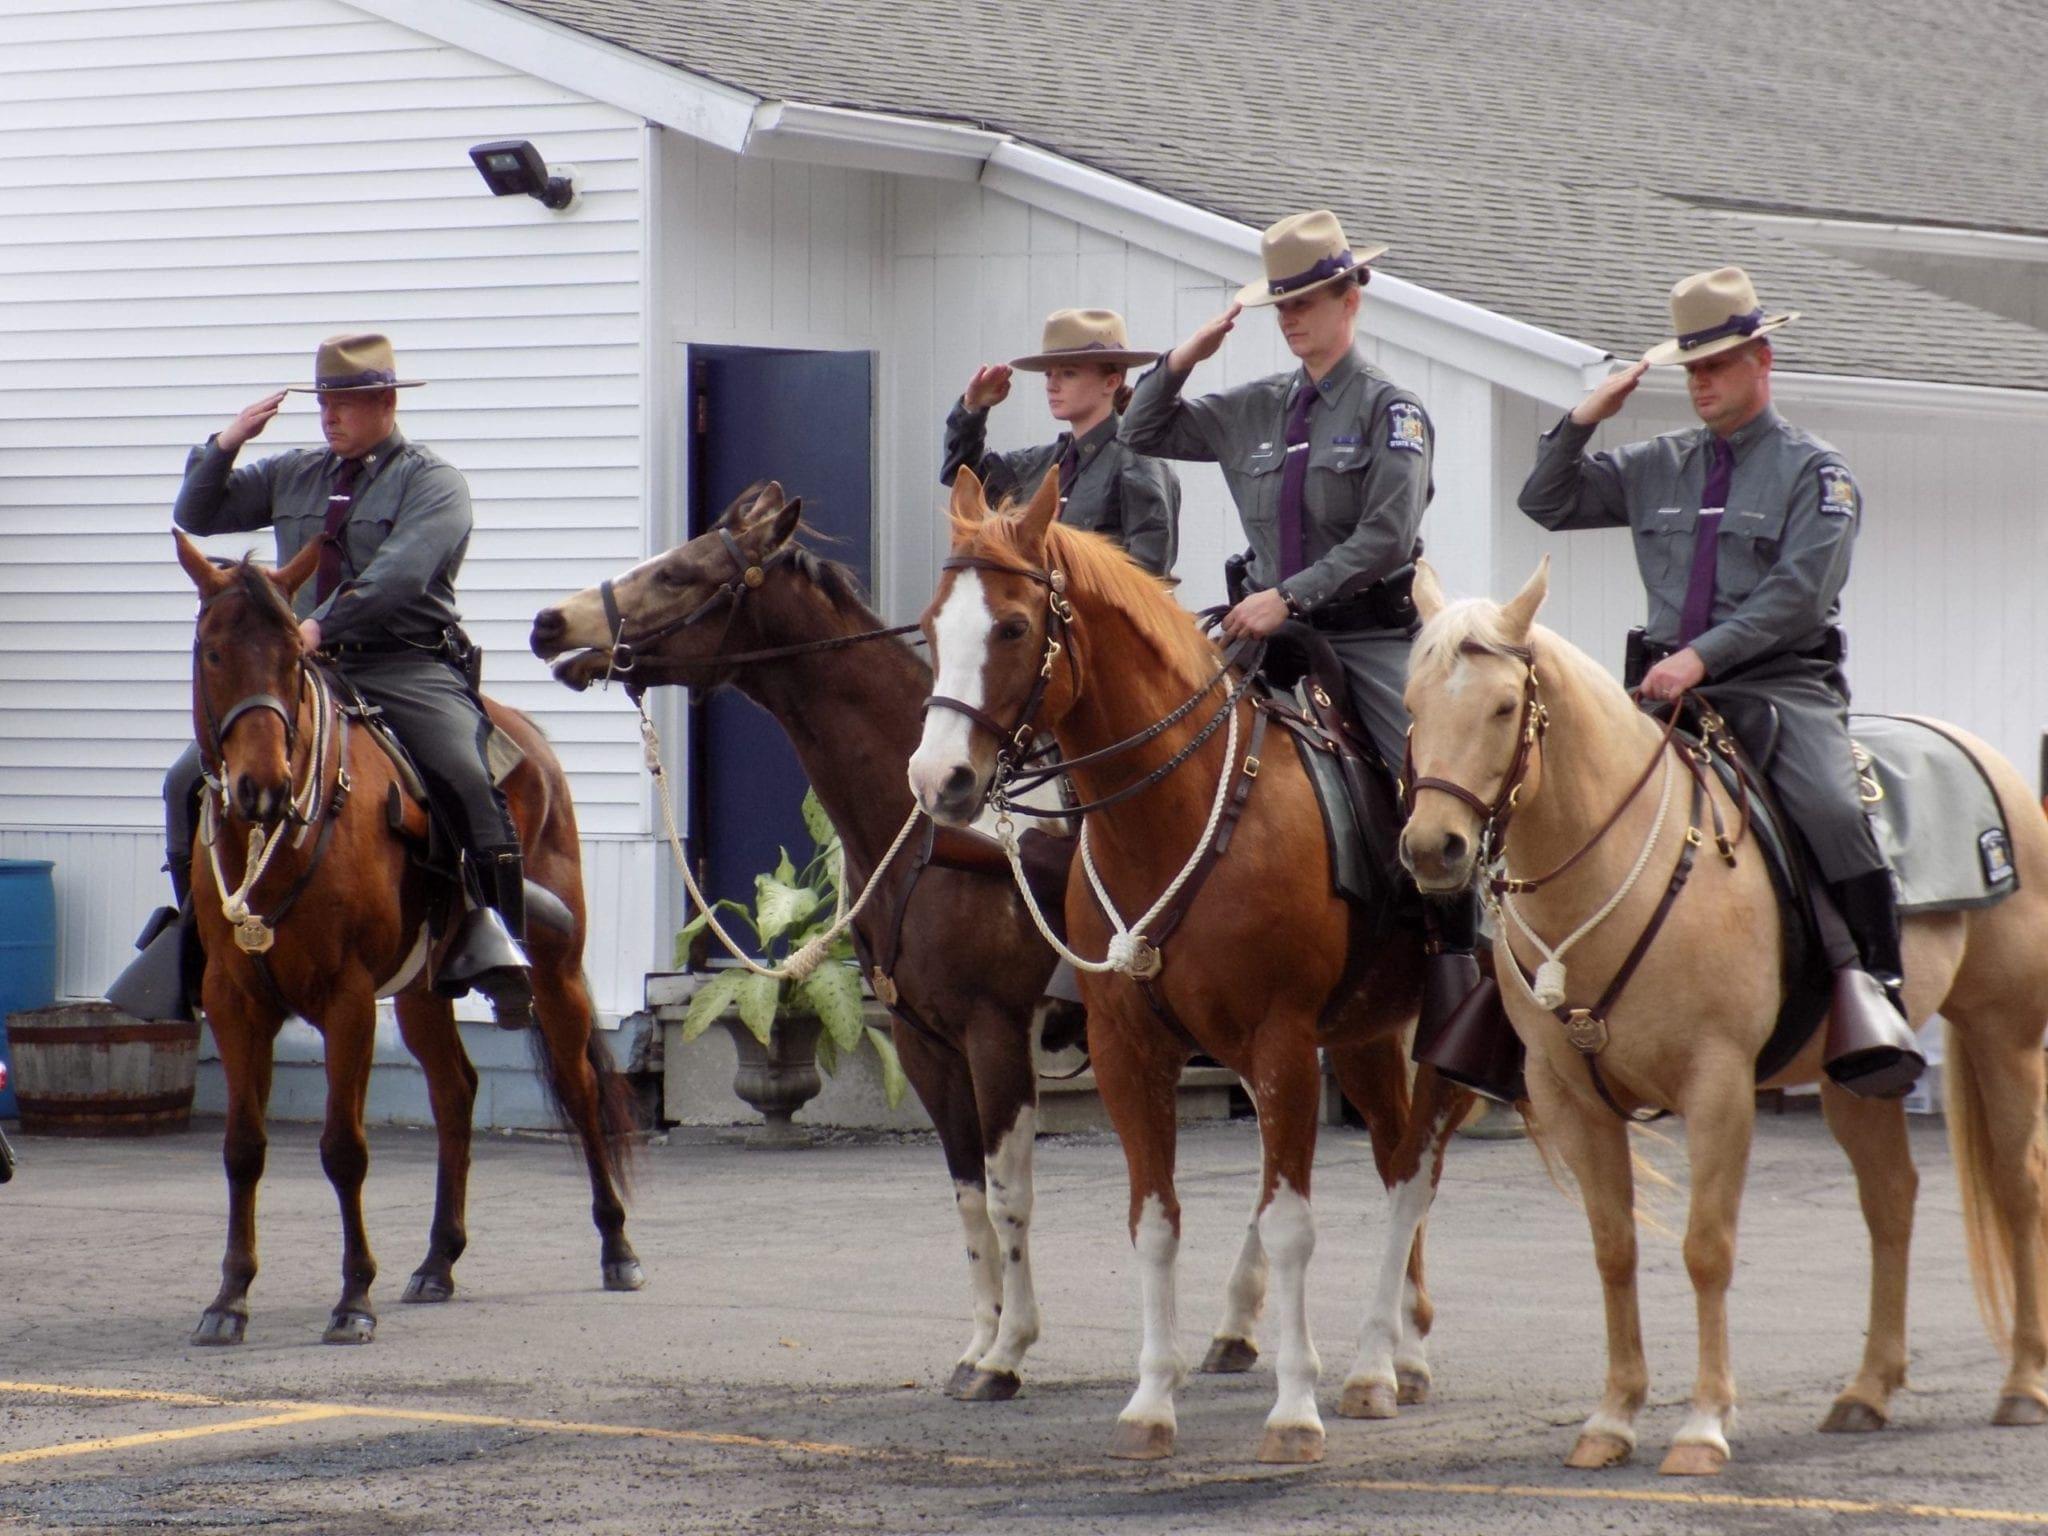 New York State Police kick-off centennial anniversary